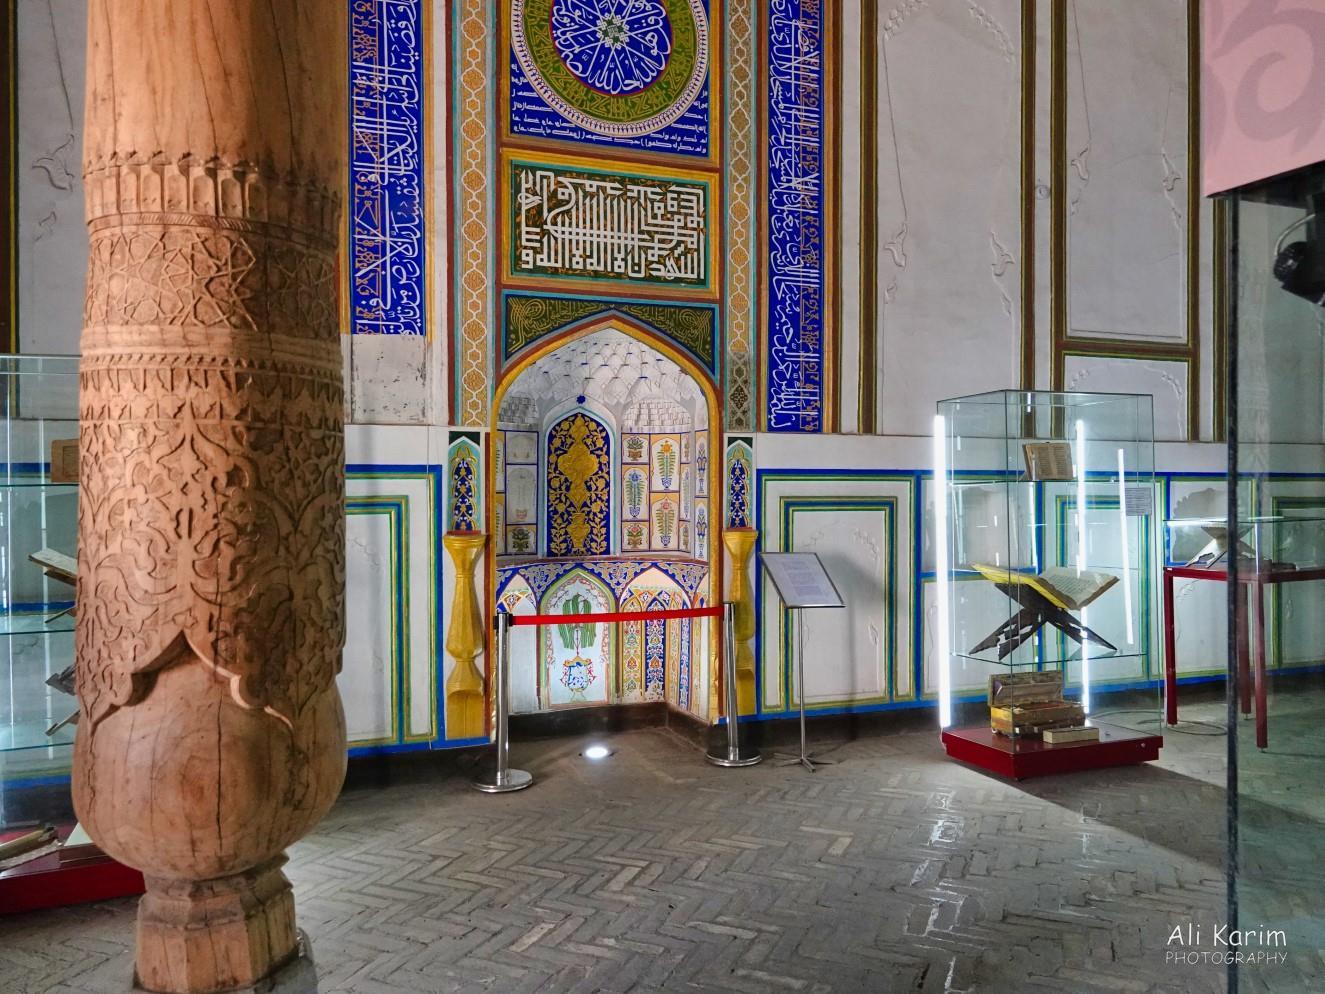 Bukhara, Oct 2019, Ornate mosque inside the Citadel